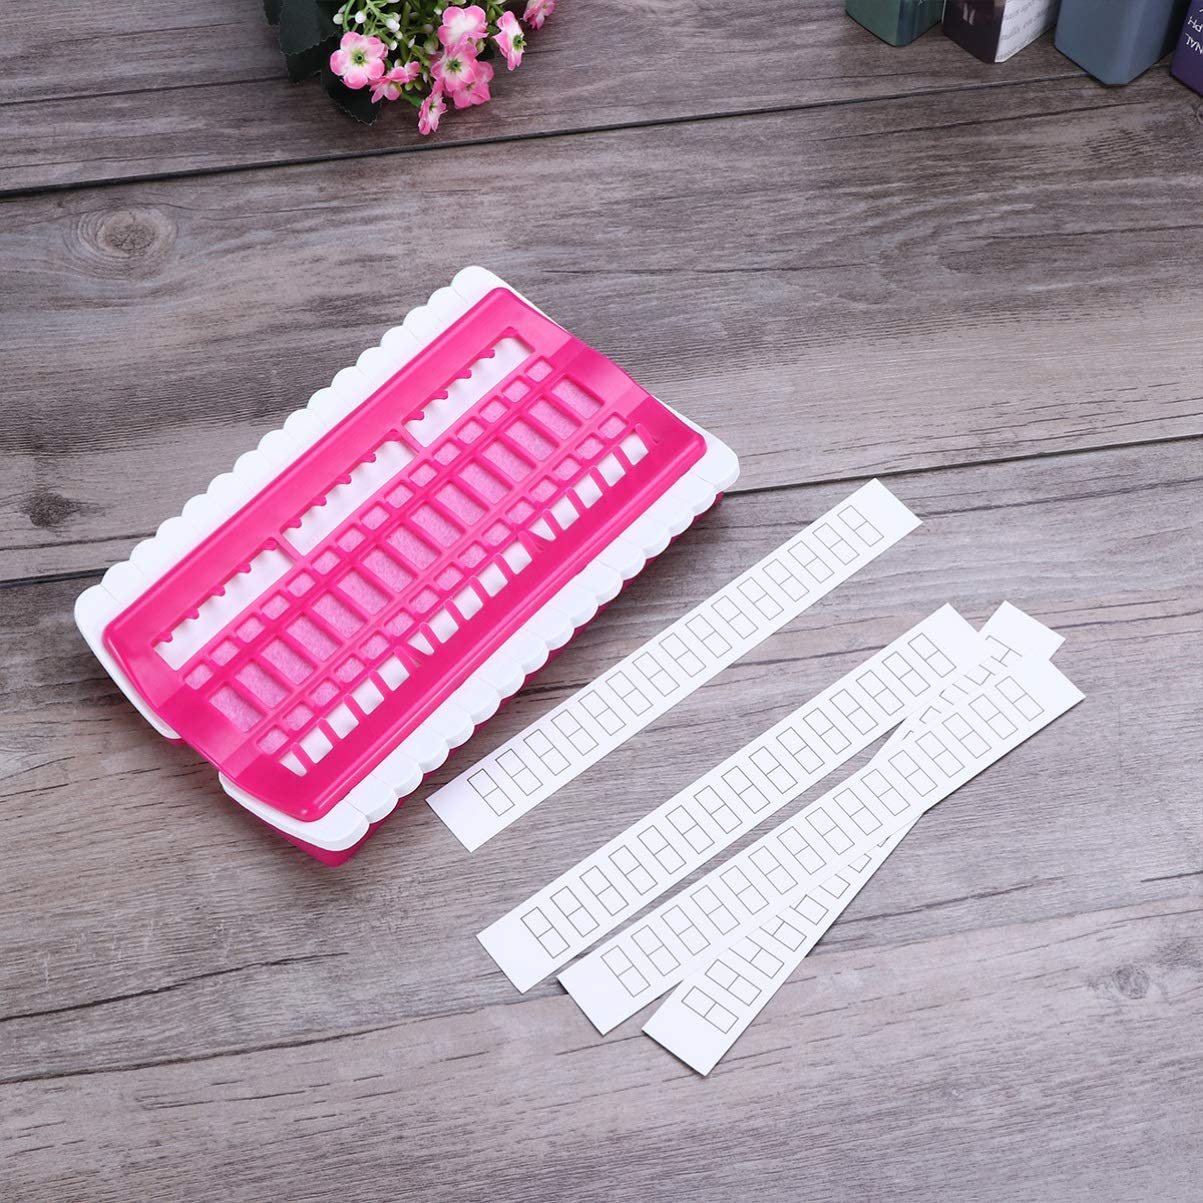 Healifty Embroidery Thread Organizer Cross Stitch Thread Holder Sewing Needle Pins Holder Craft Tools Accessory